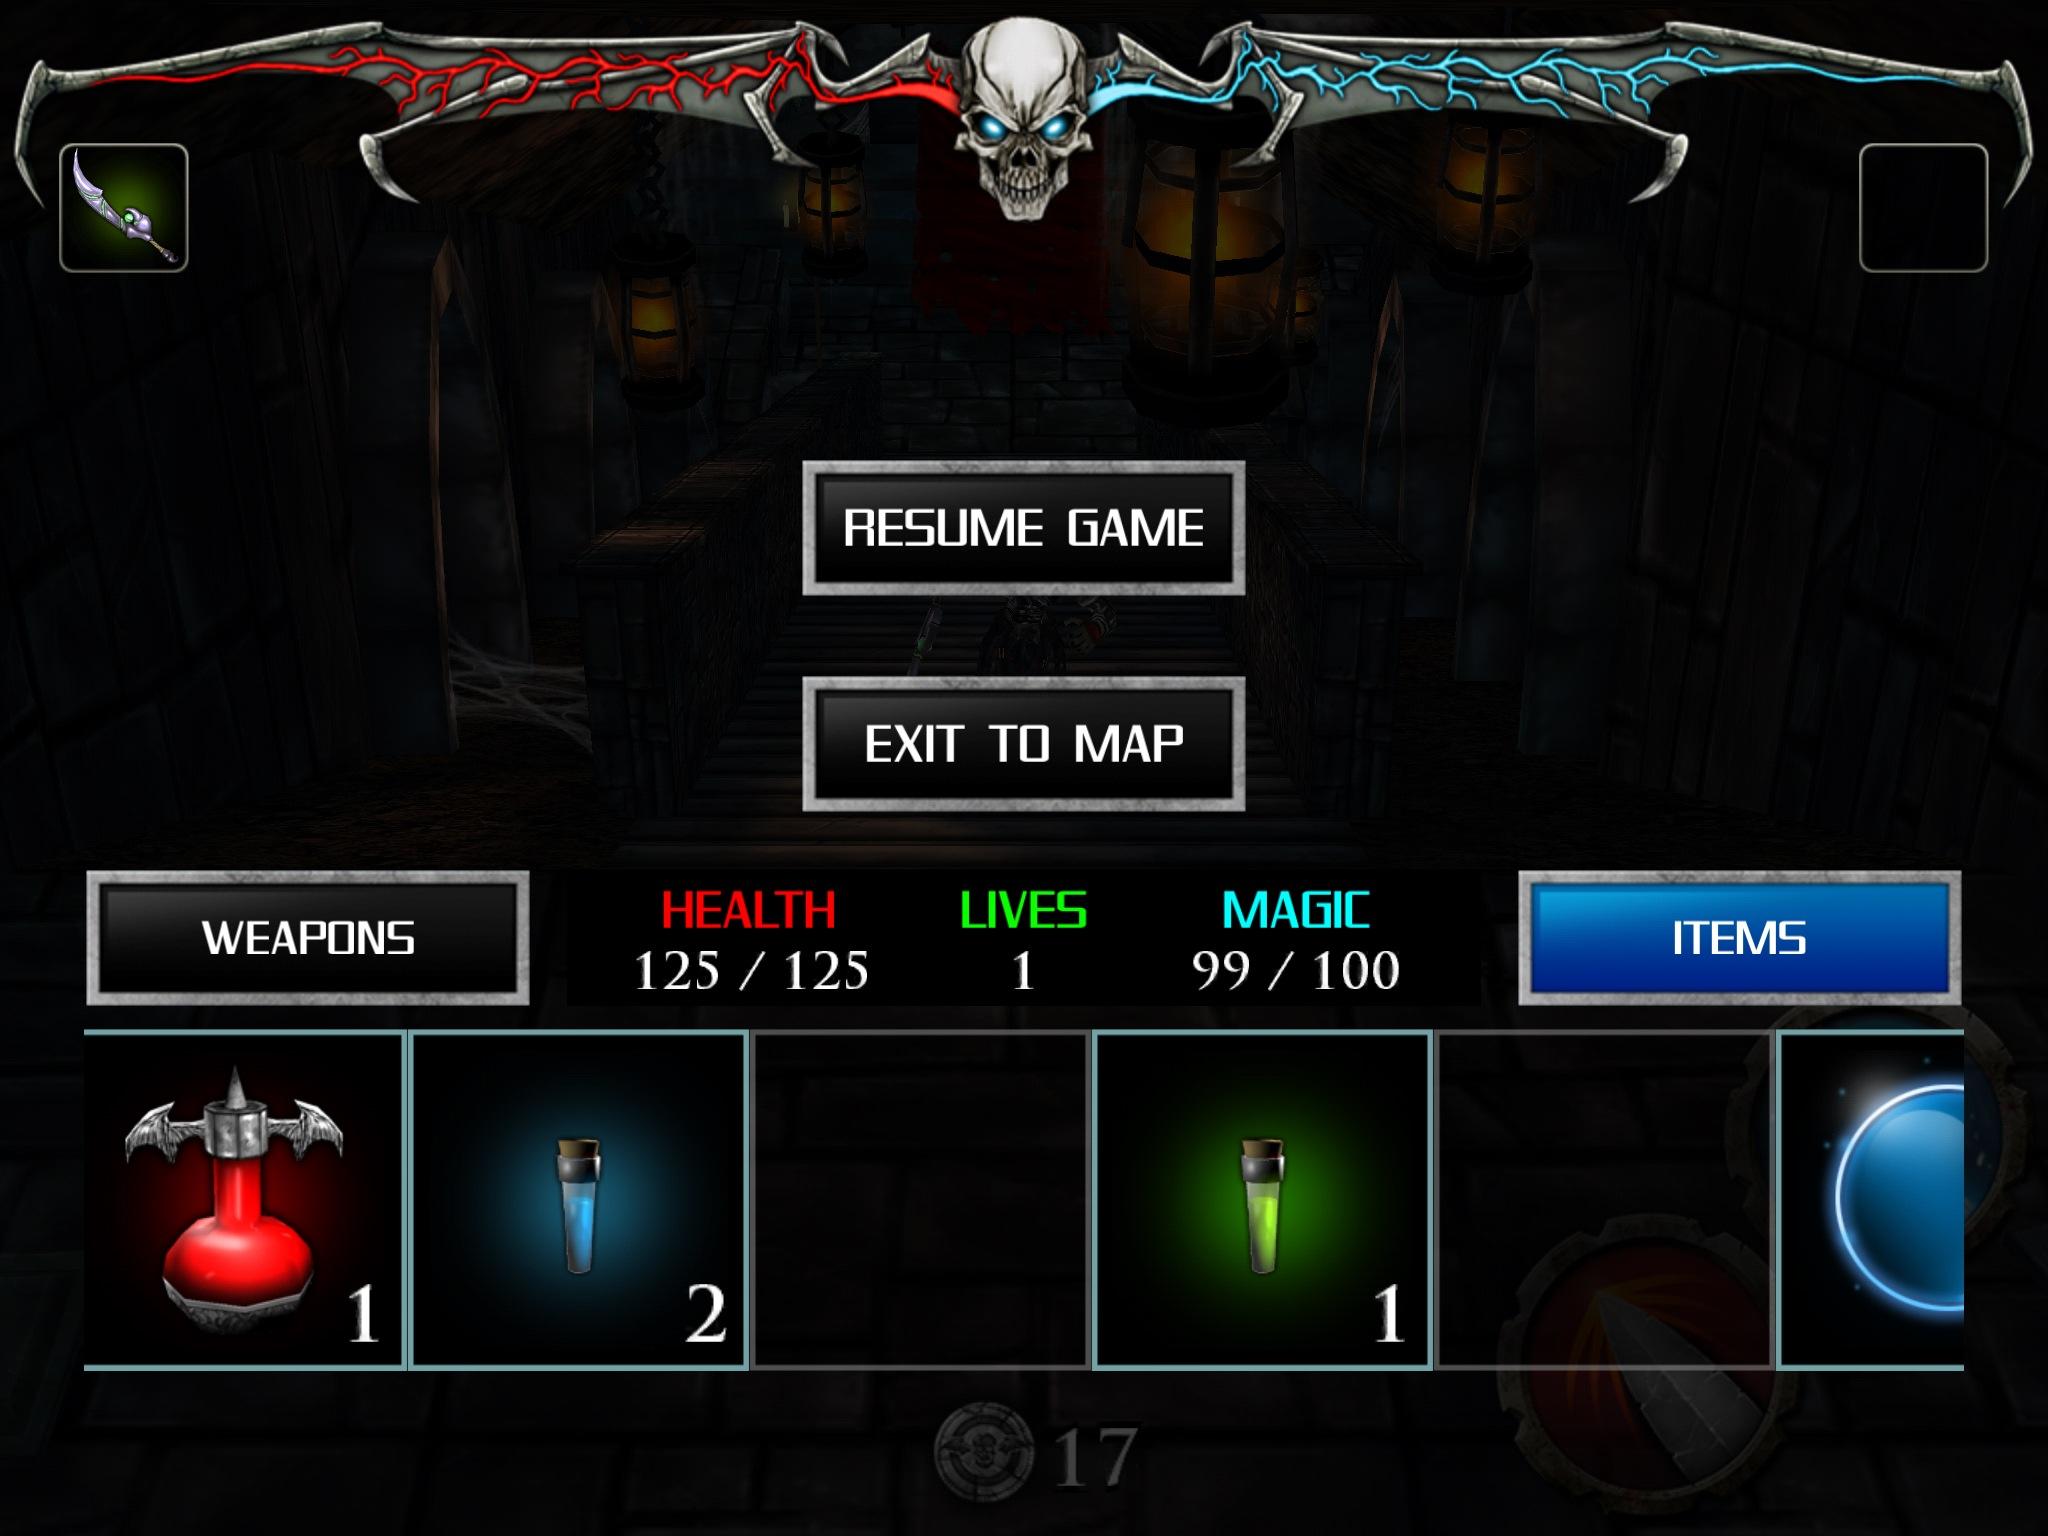 download game hail to the king deathbat mod apk